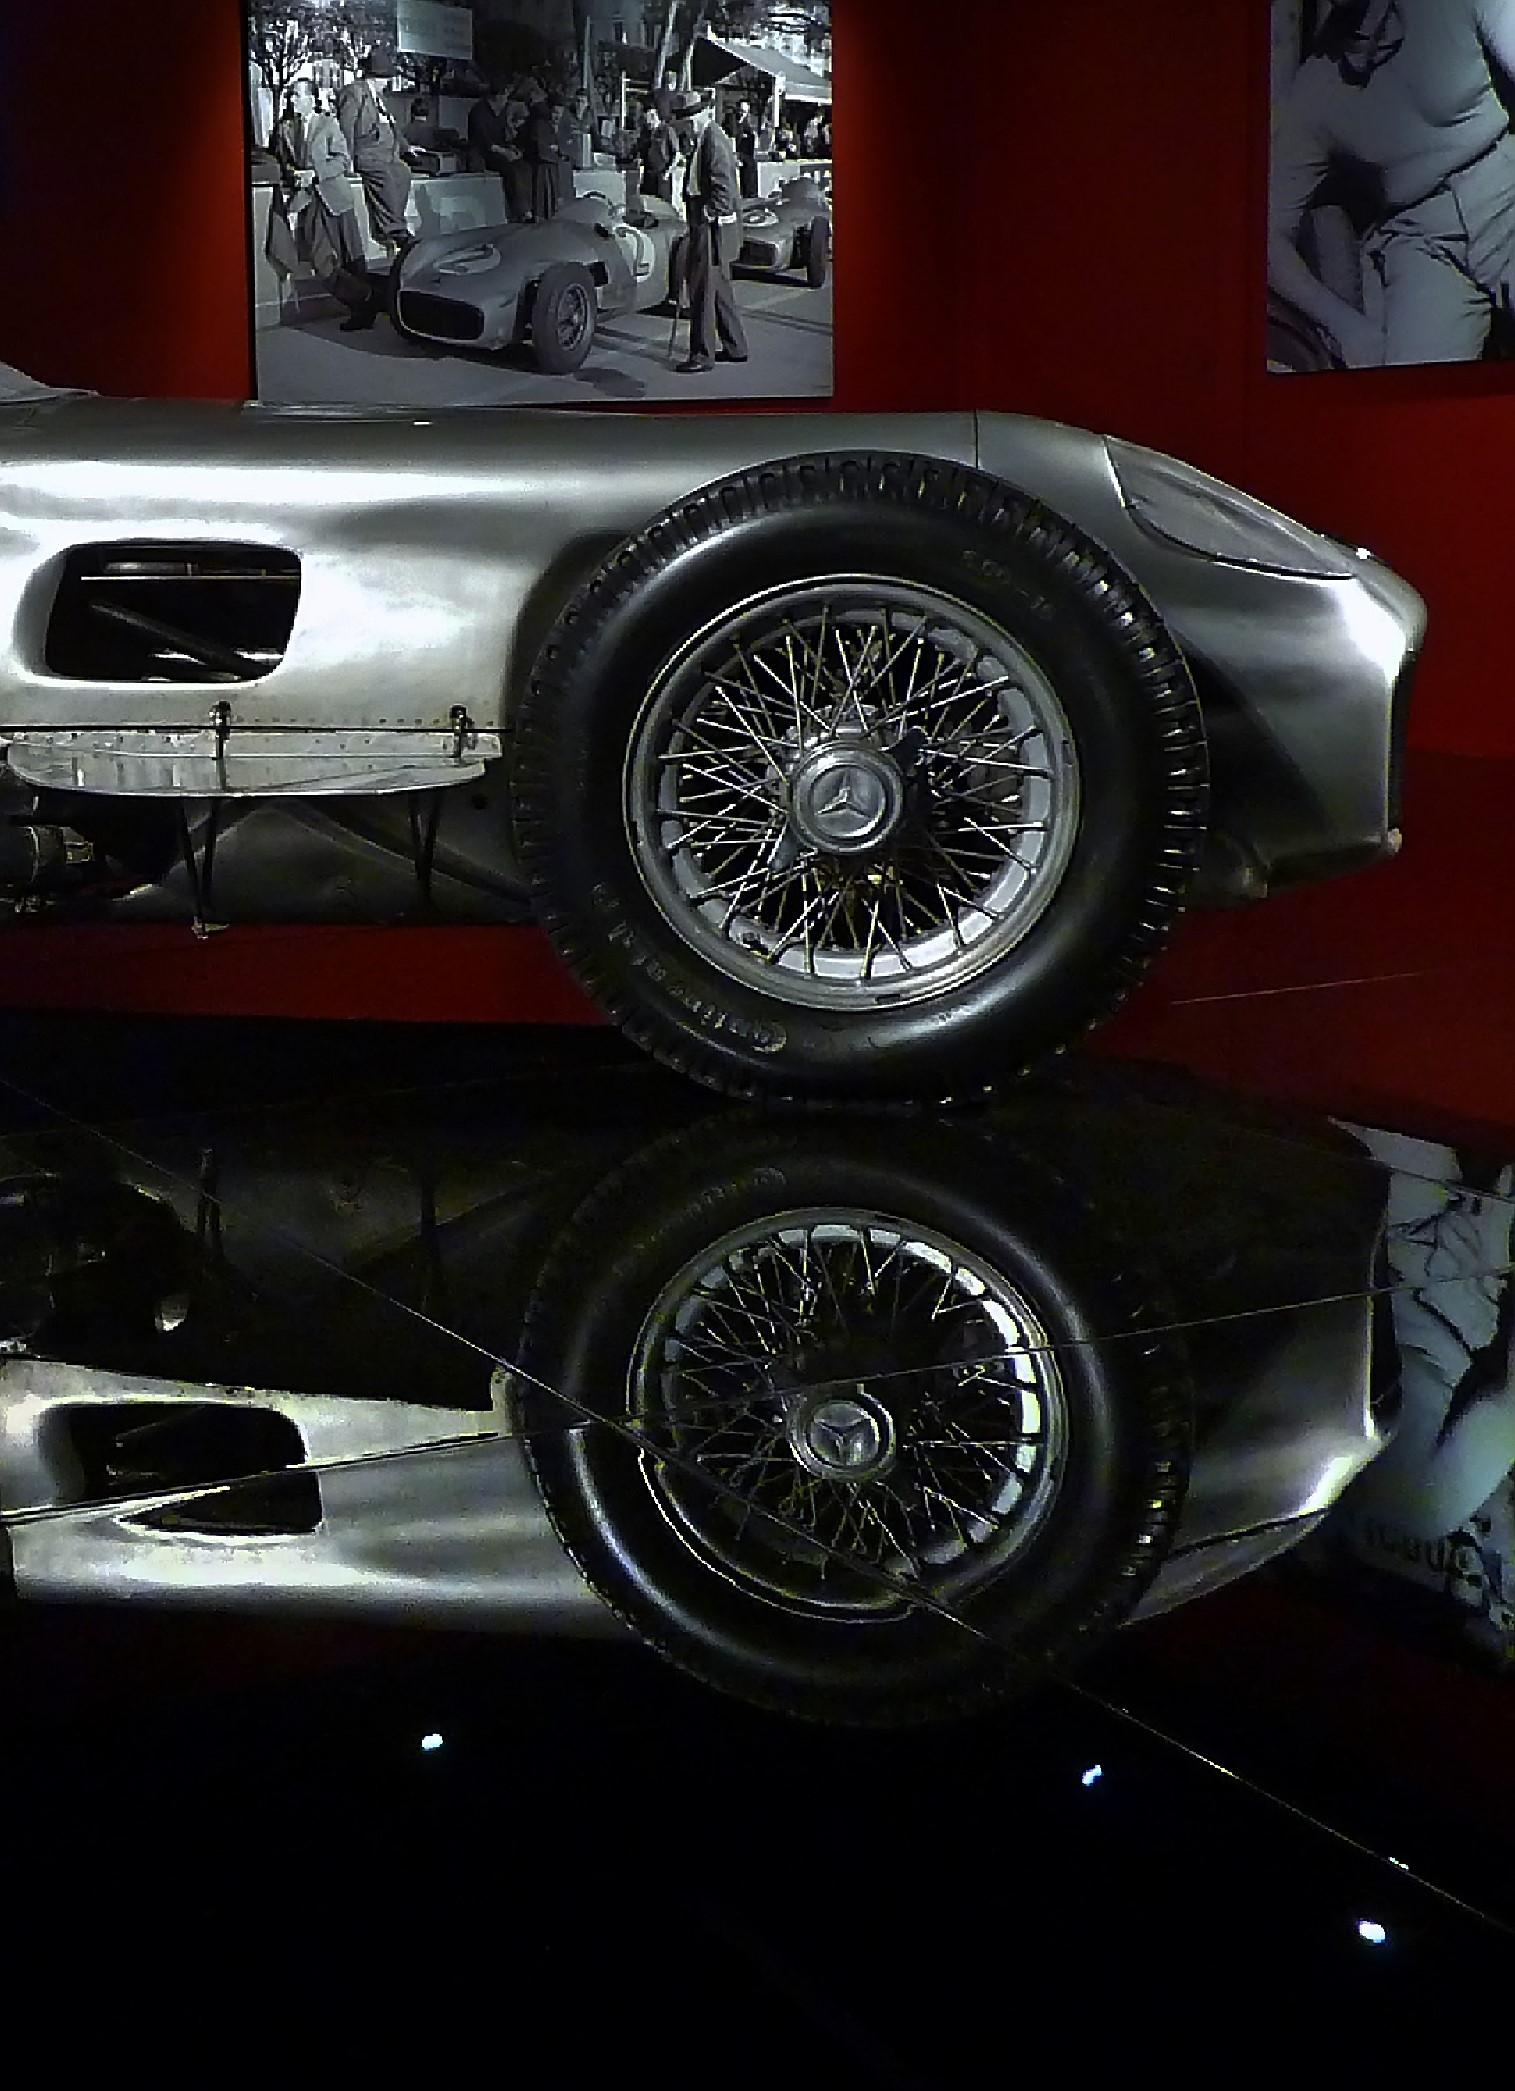 1954 Mercedes Benz W196 Silver Arrow (2)